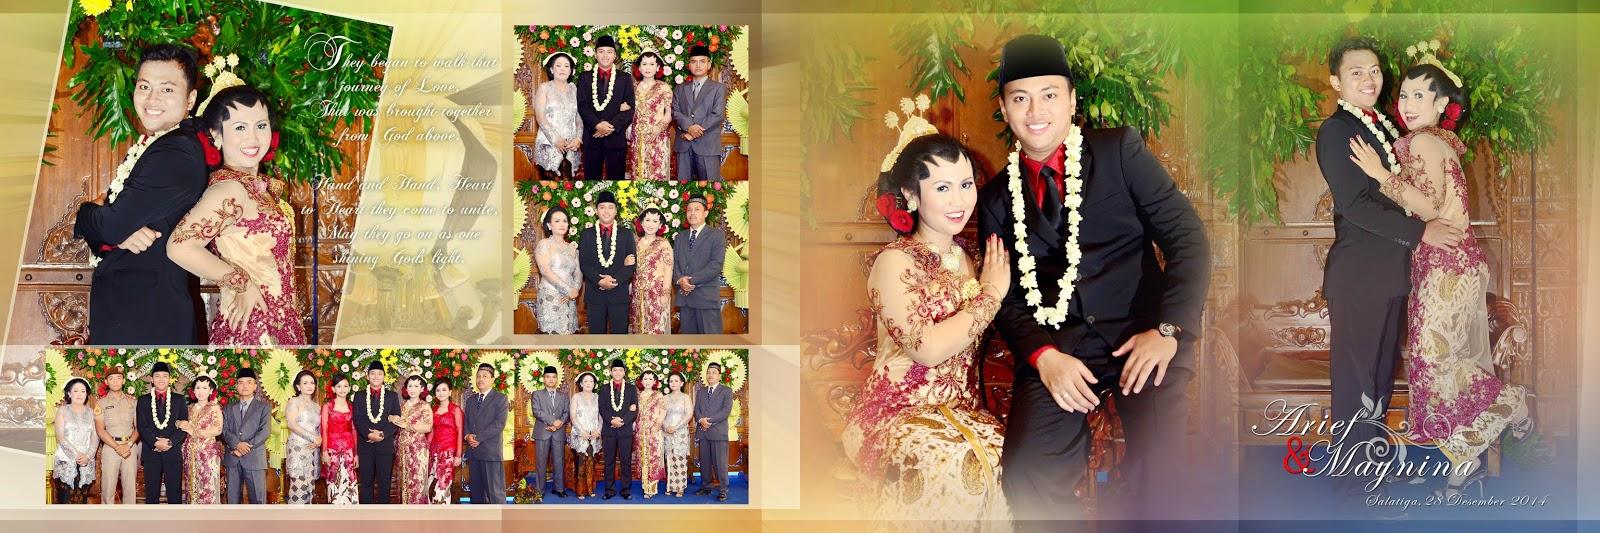 Jasa dokumentasi Pernikahan